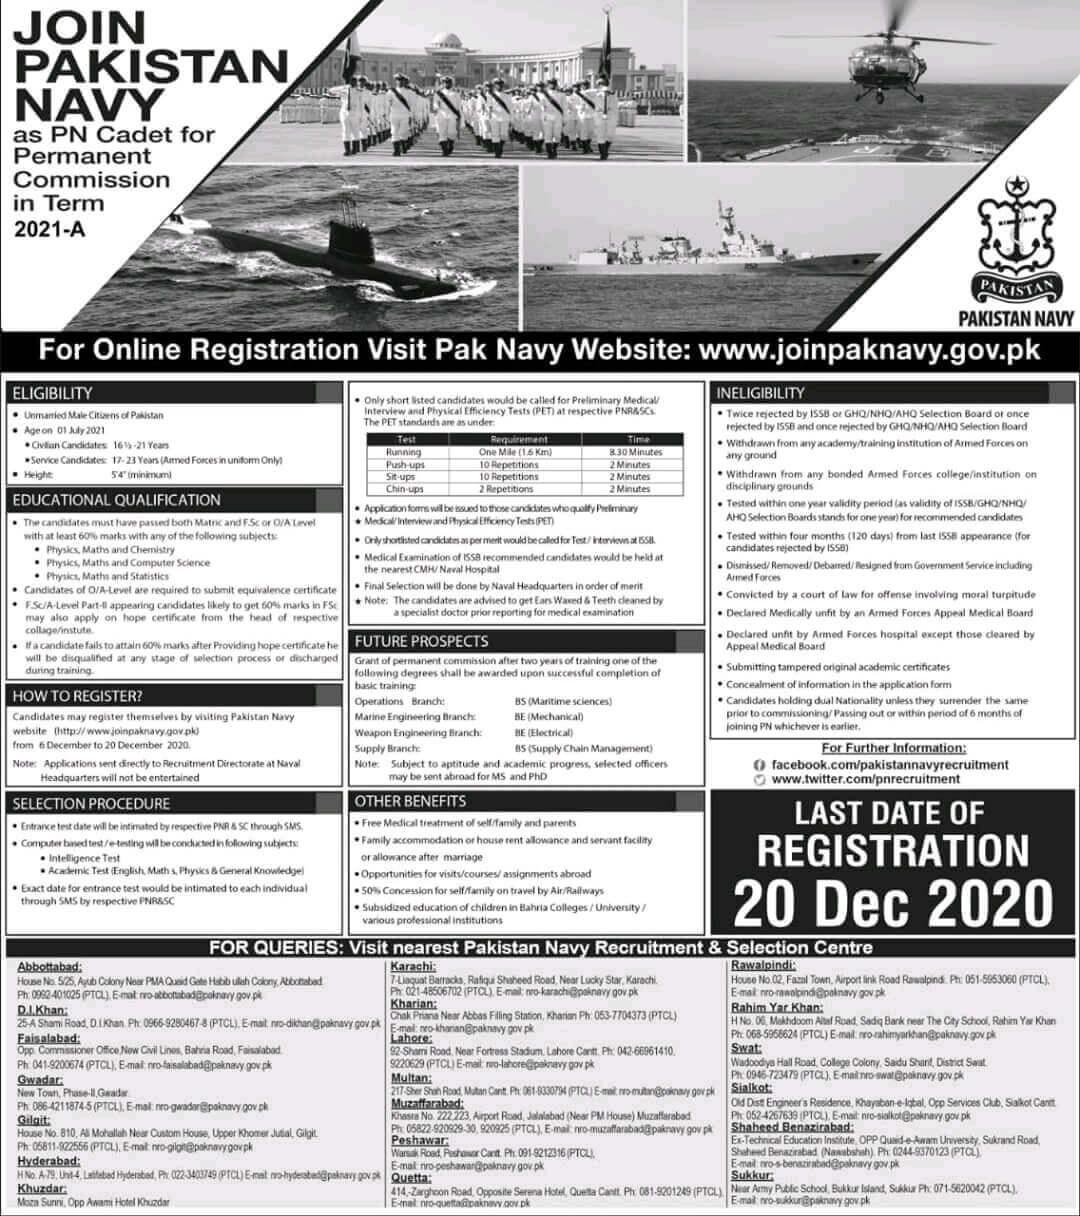 Join Pak Navy as PN Cadet Online Registration 2021-A Permanent Commission